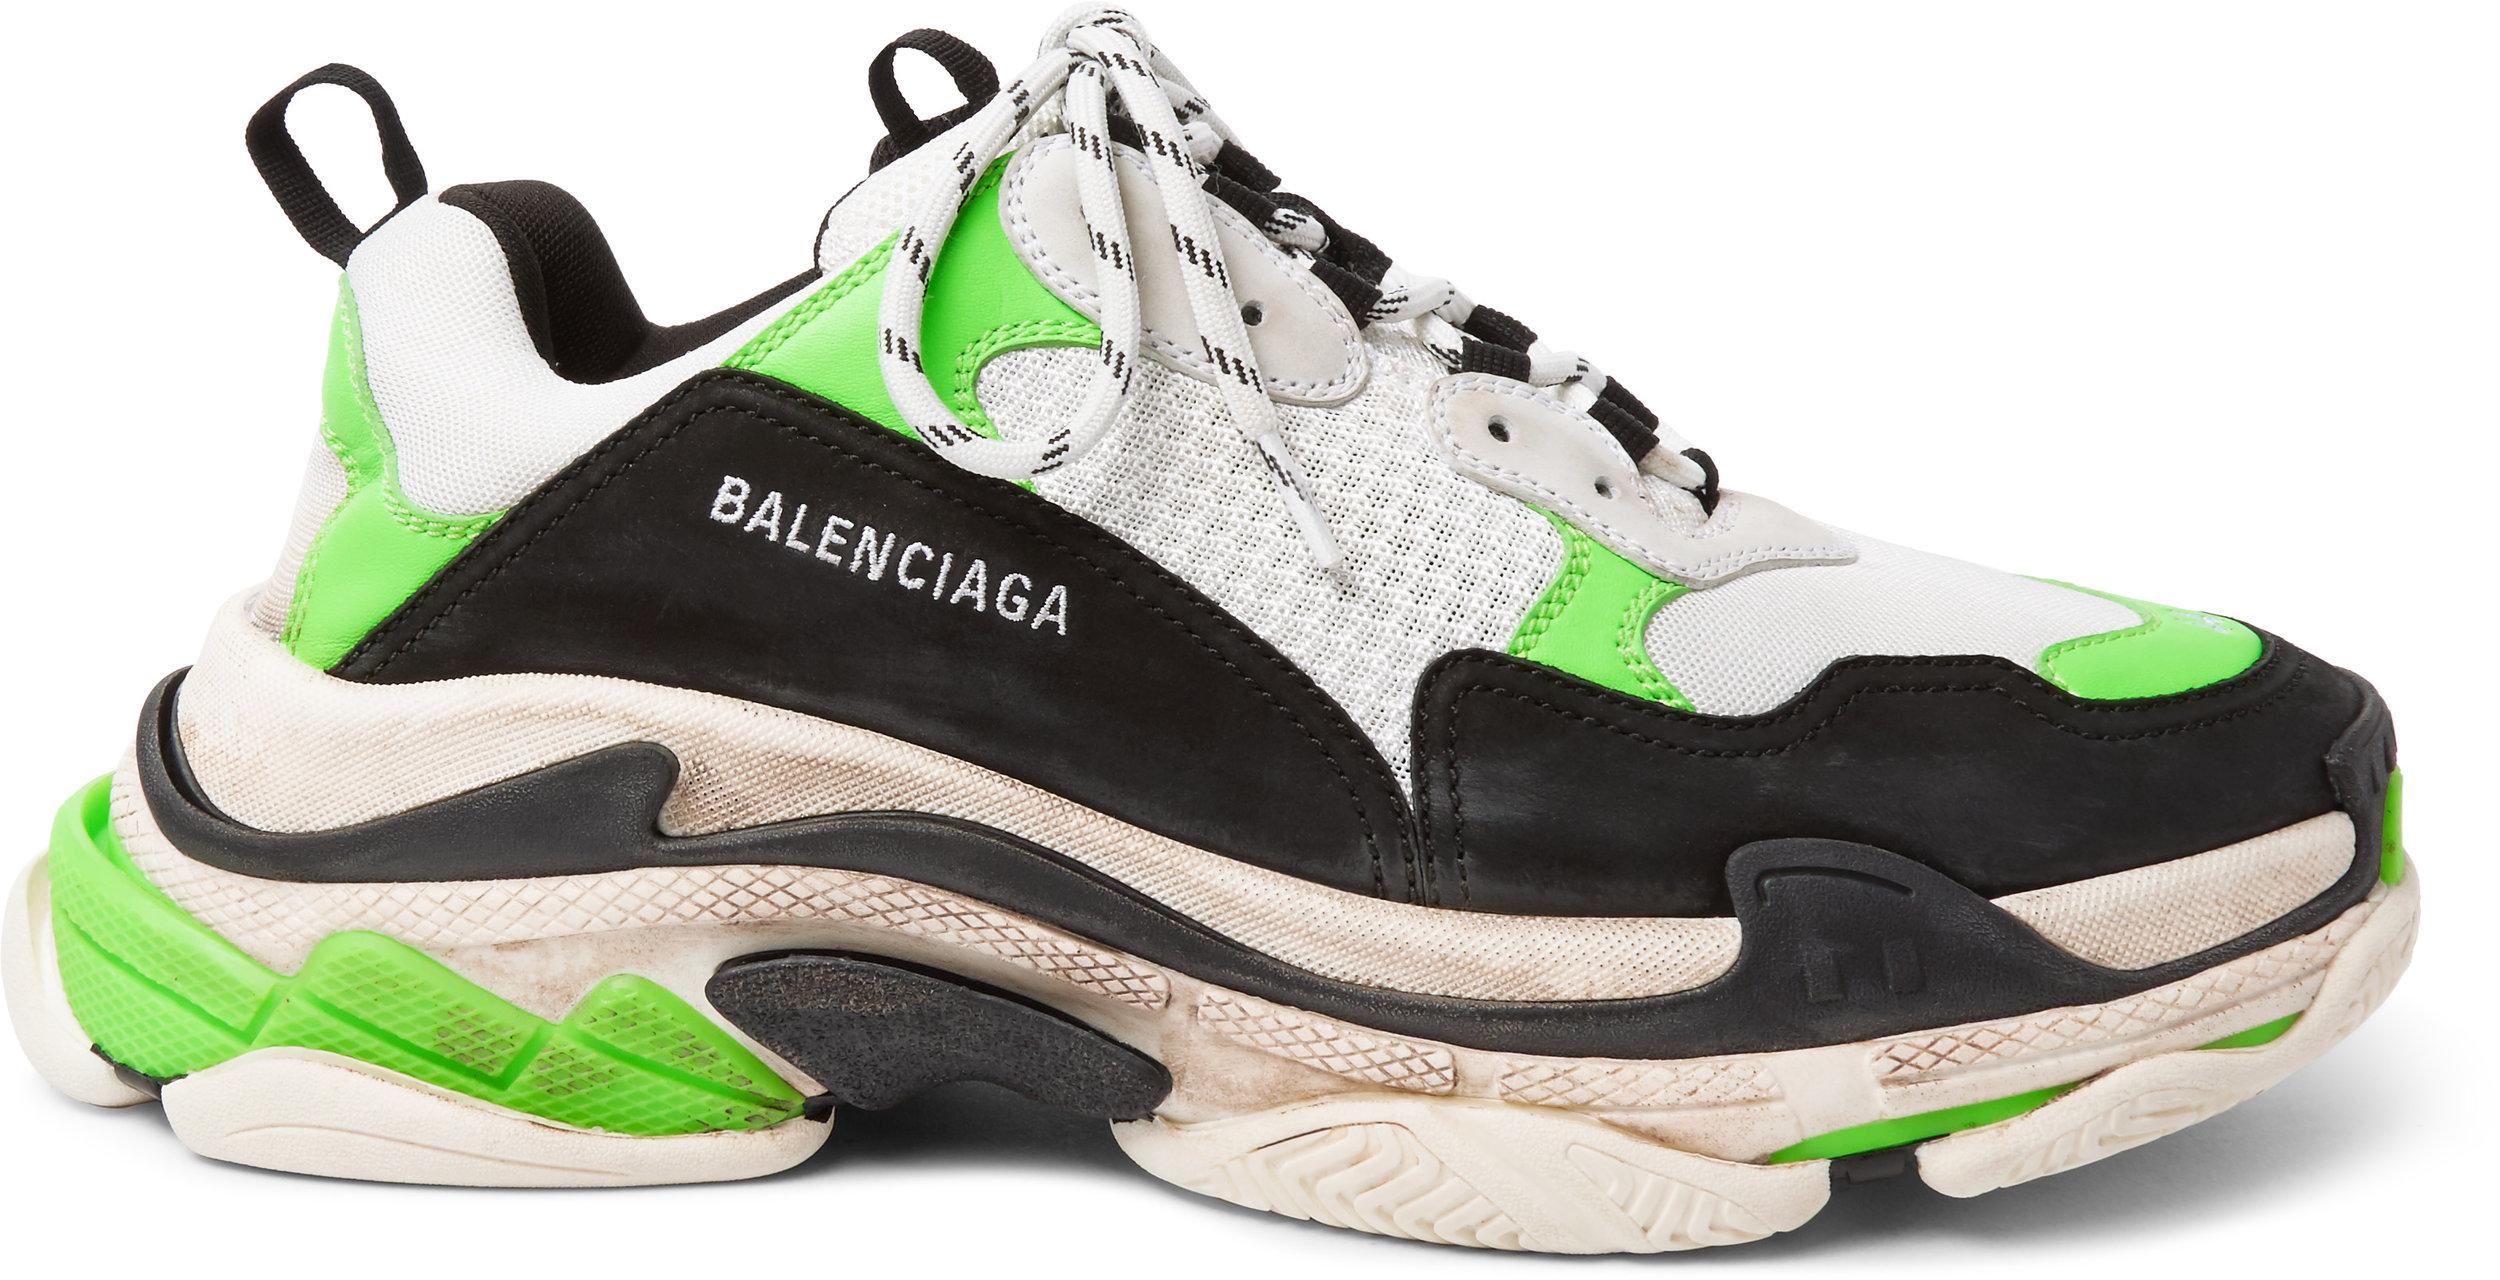 MR PORTER X BALENCIAGA Triple S Mesh, Nubuck and Leather Sneakers 1018515_mrp_in.jpg